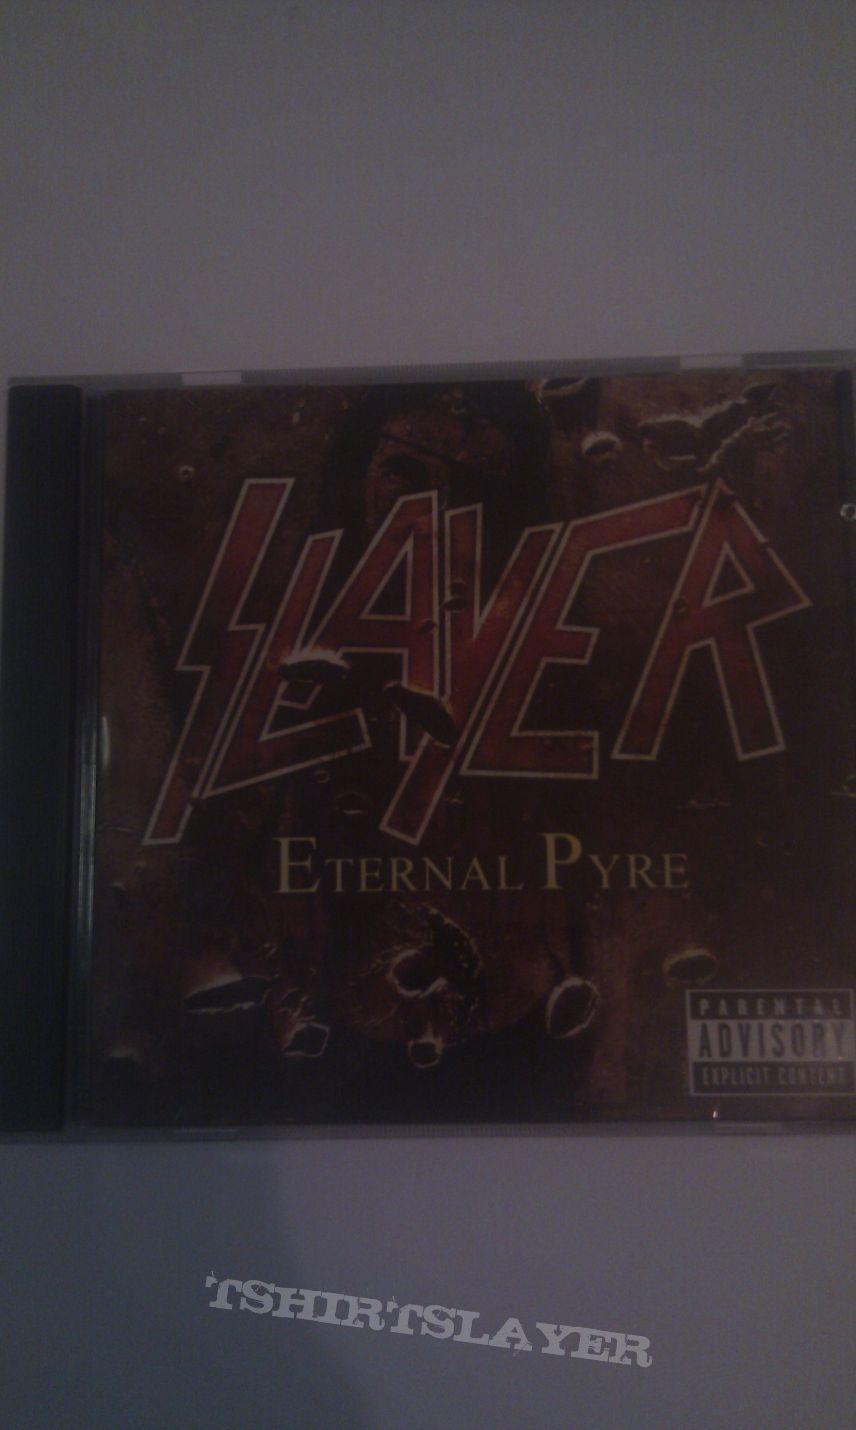 Slayer - Eternal pyre (European release)